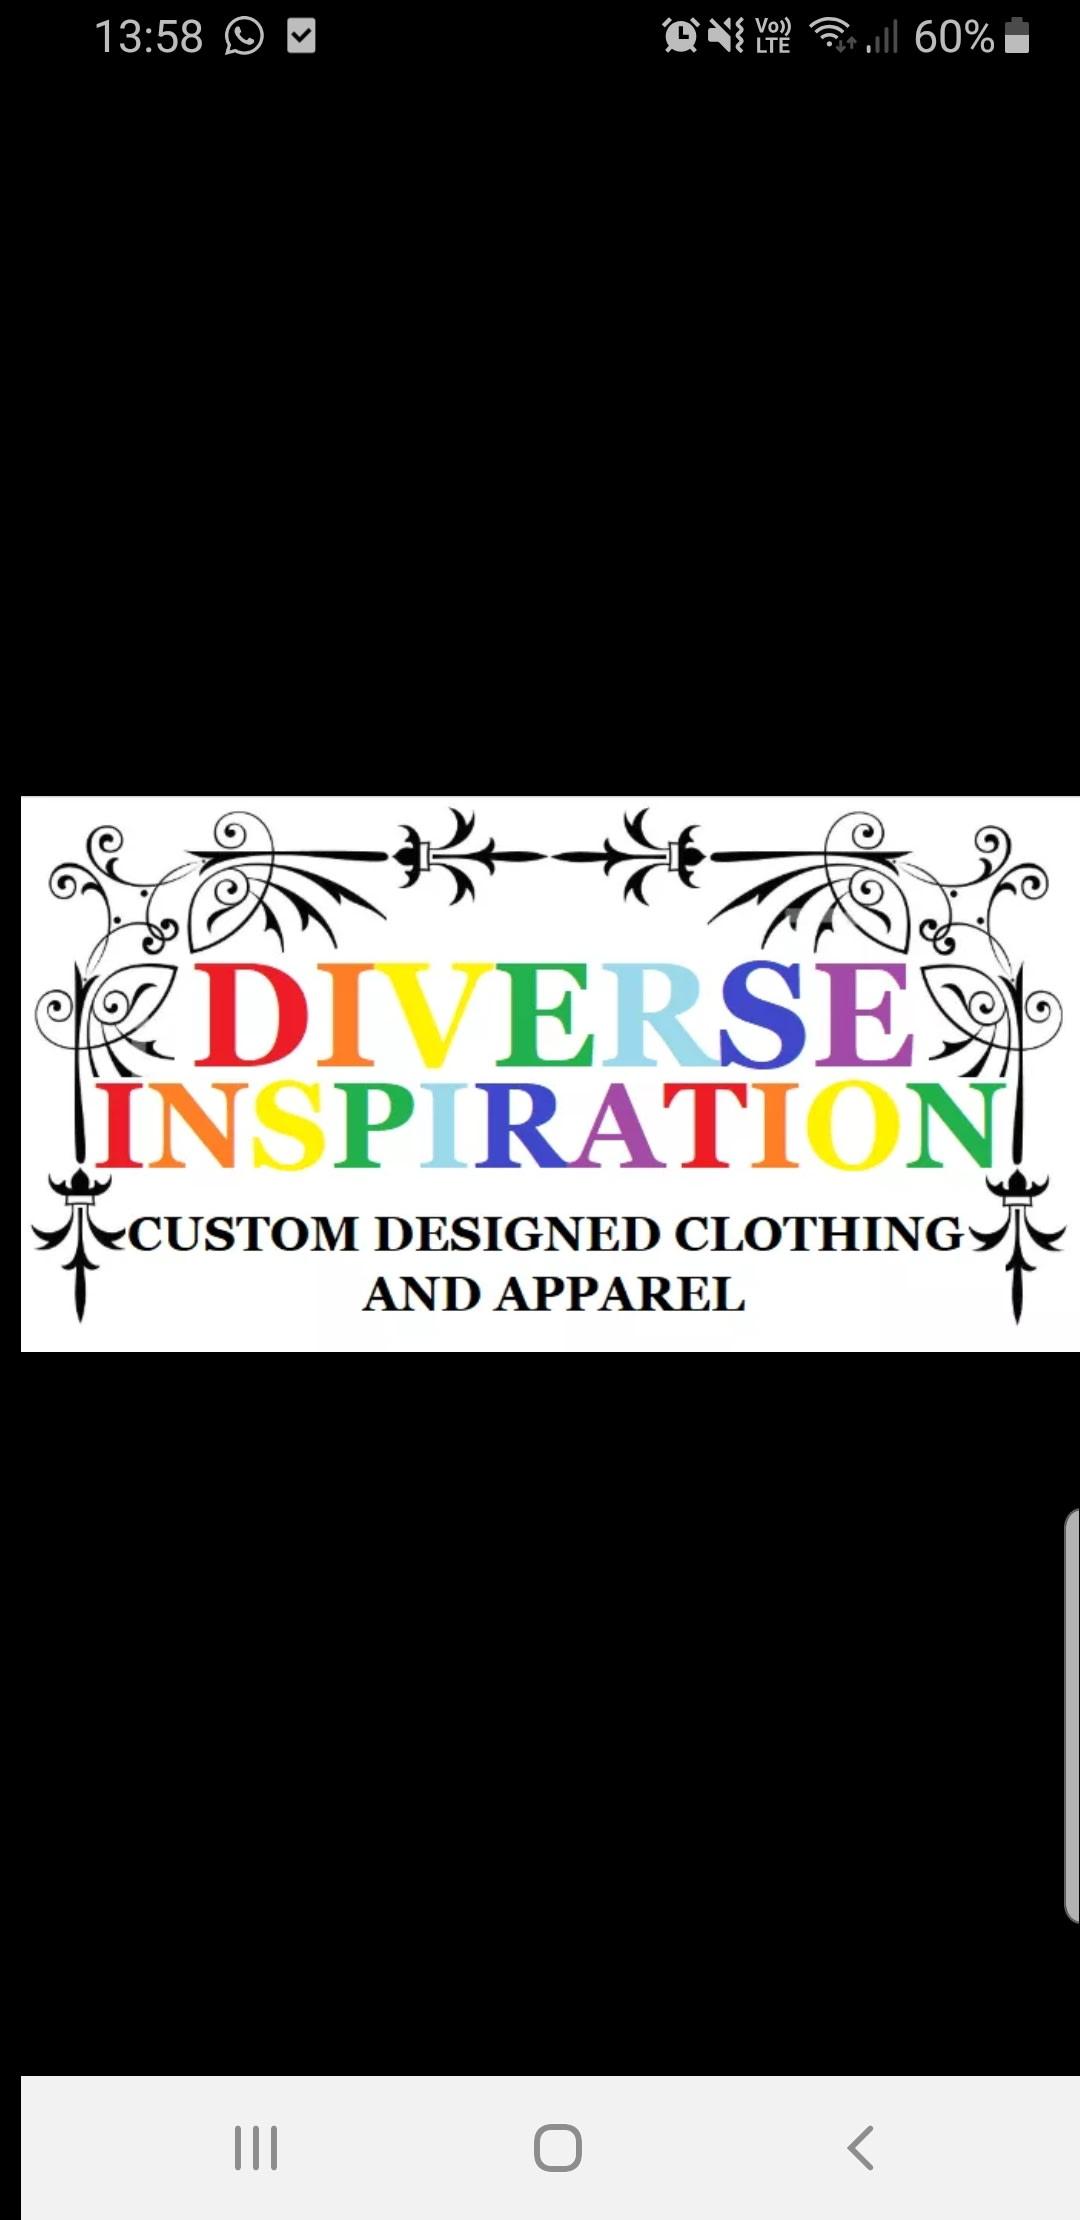 Diverse Inspiration